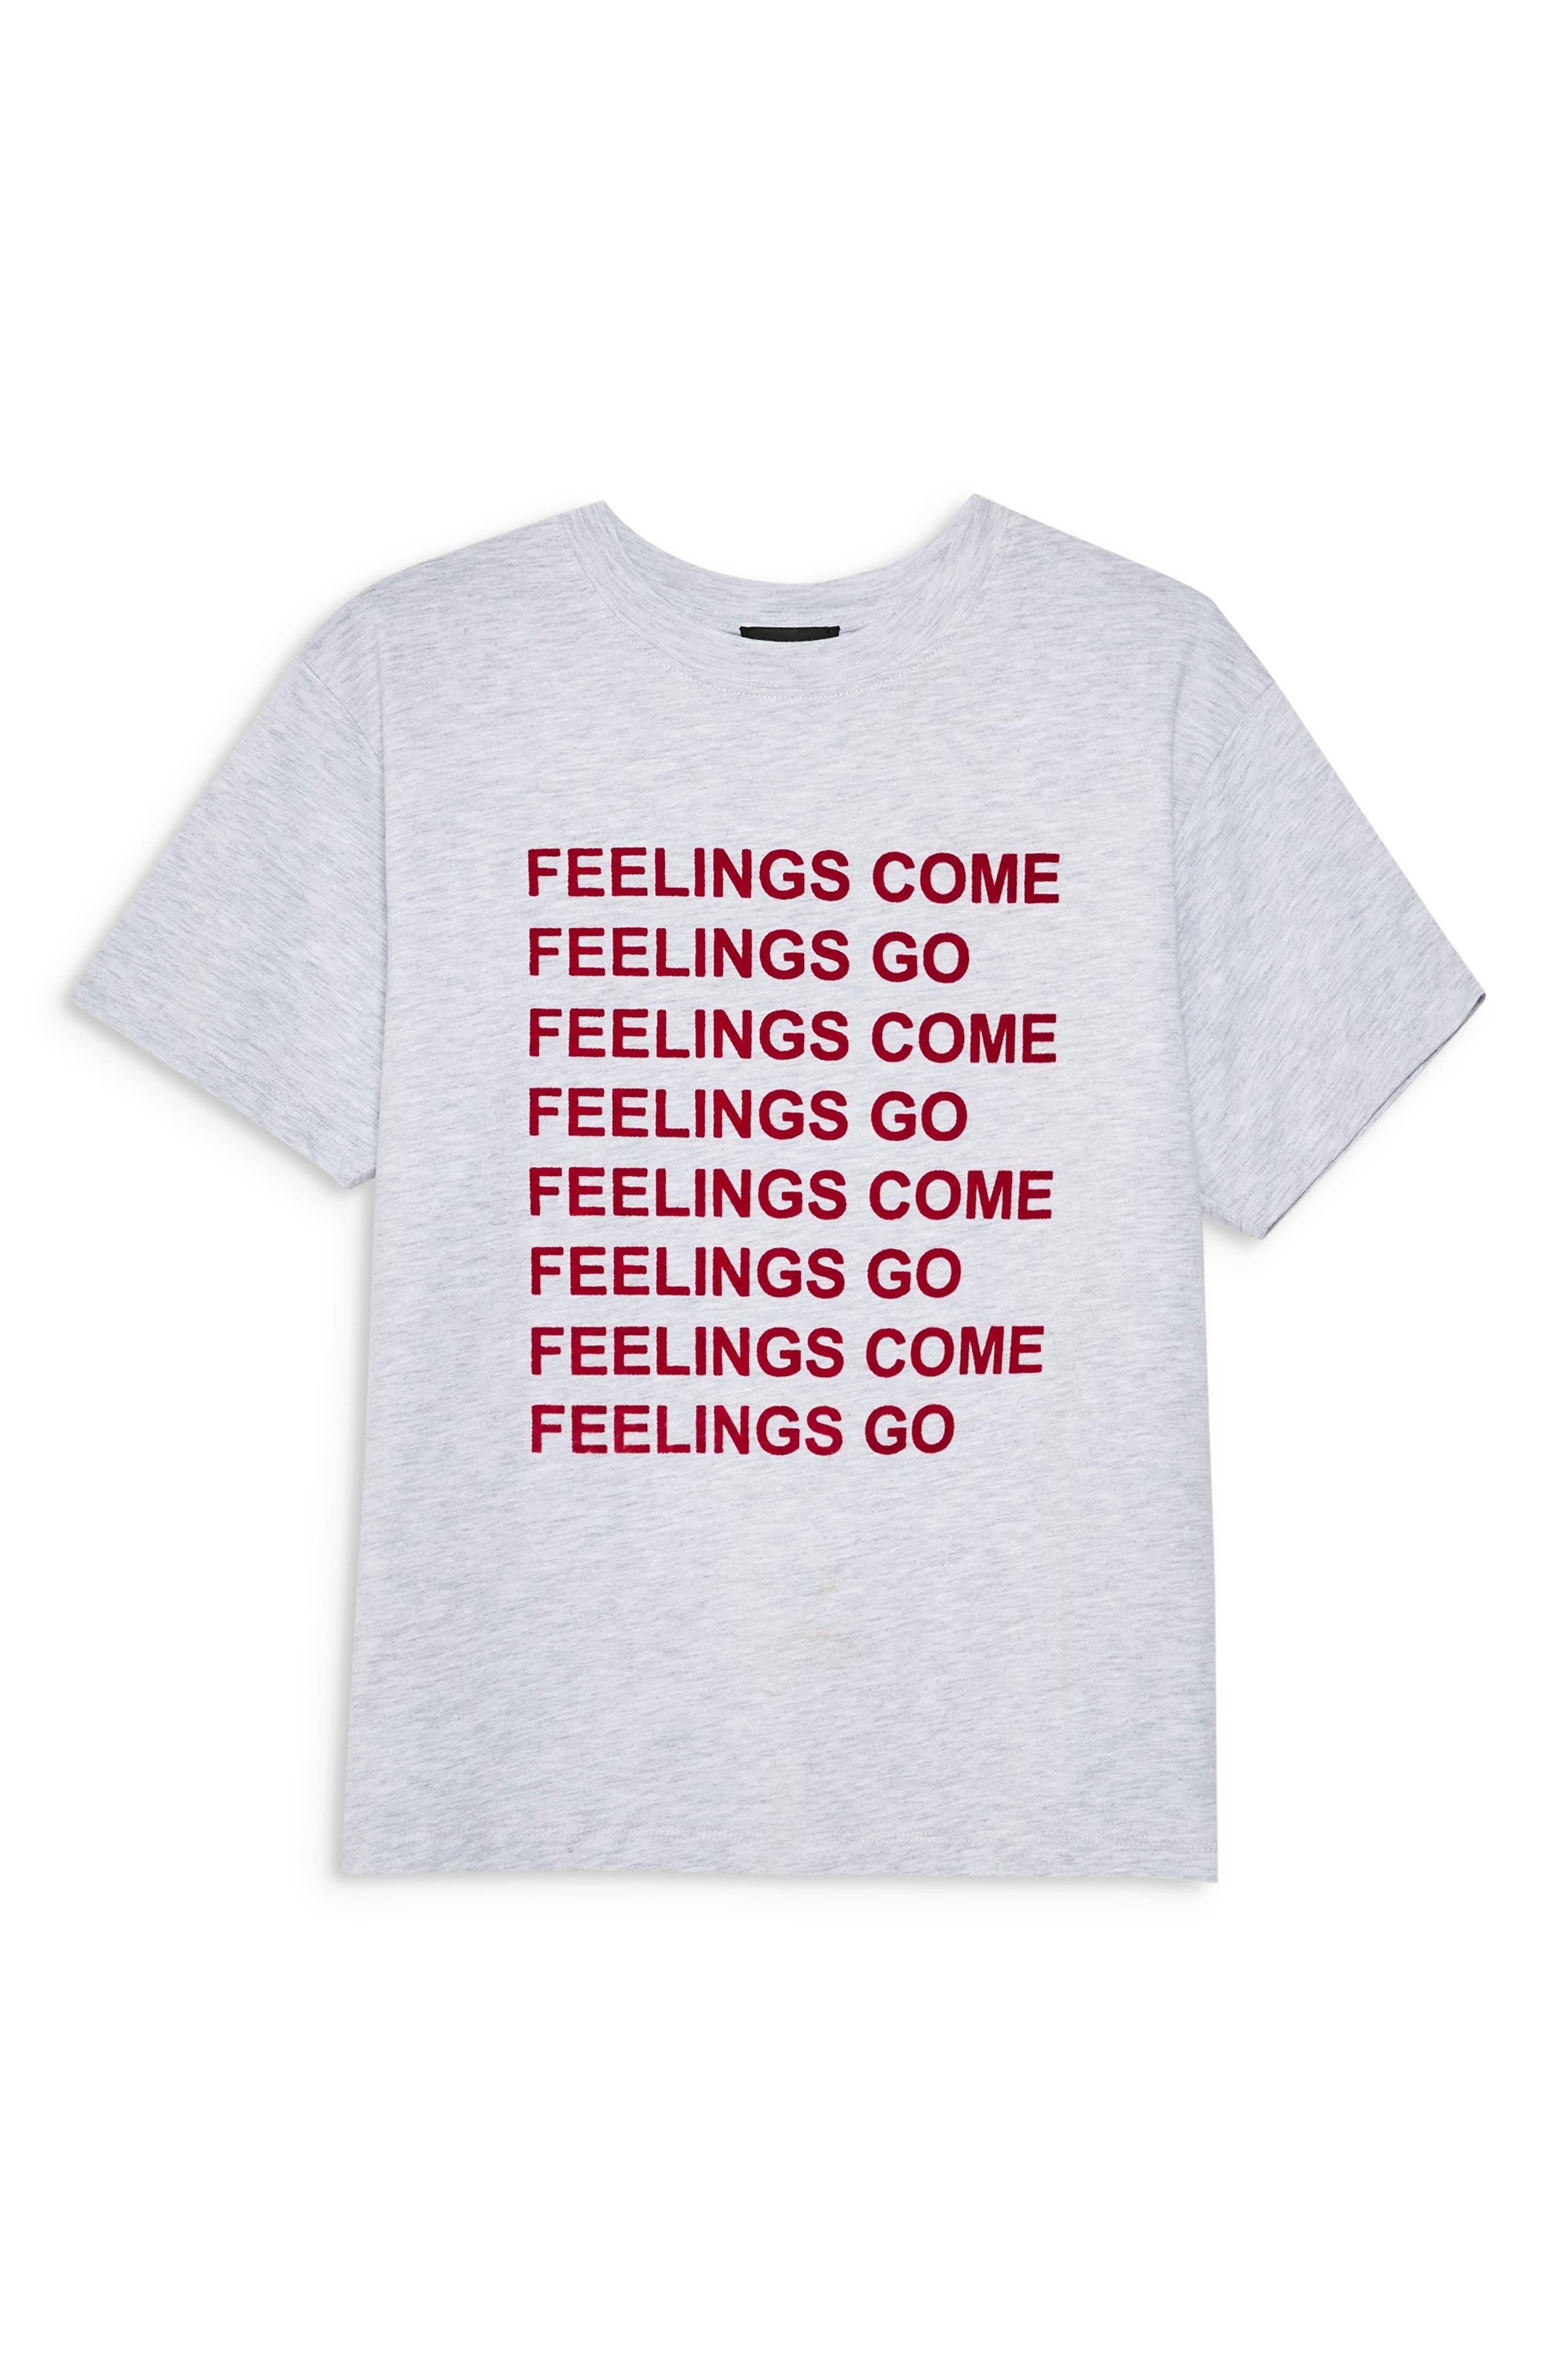 Feelings Come Tee,                             Alternate thumbnail 3, color,                             GREY MARL MULTI